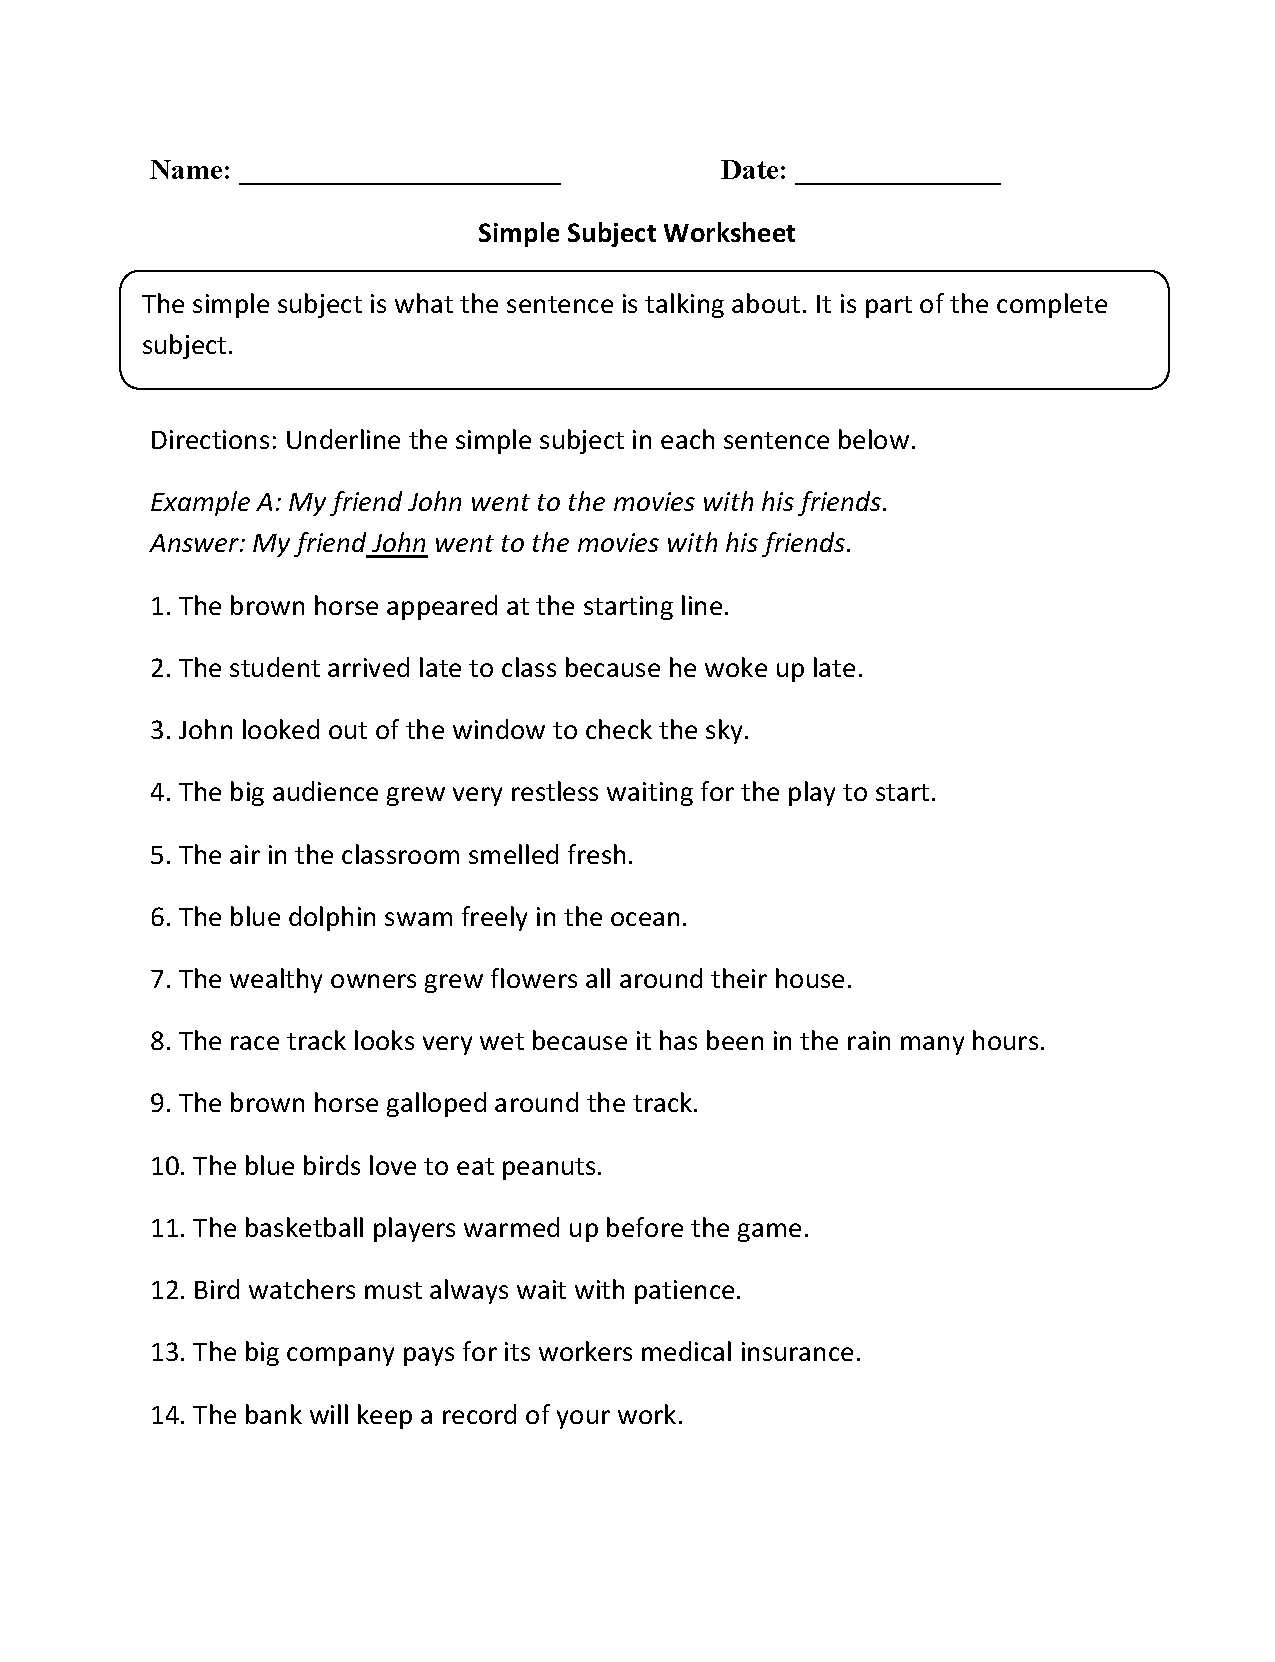 Simple Subject Worksheet